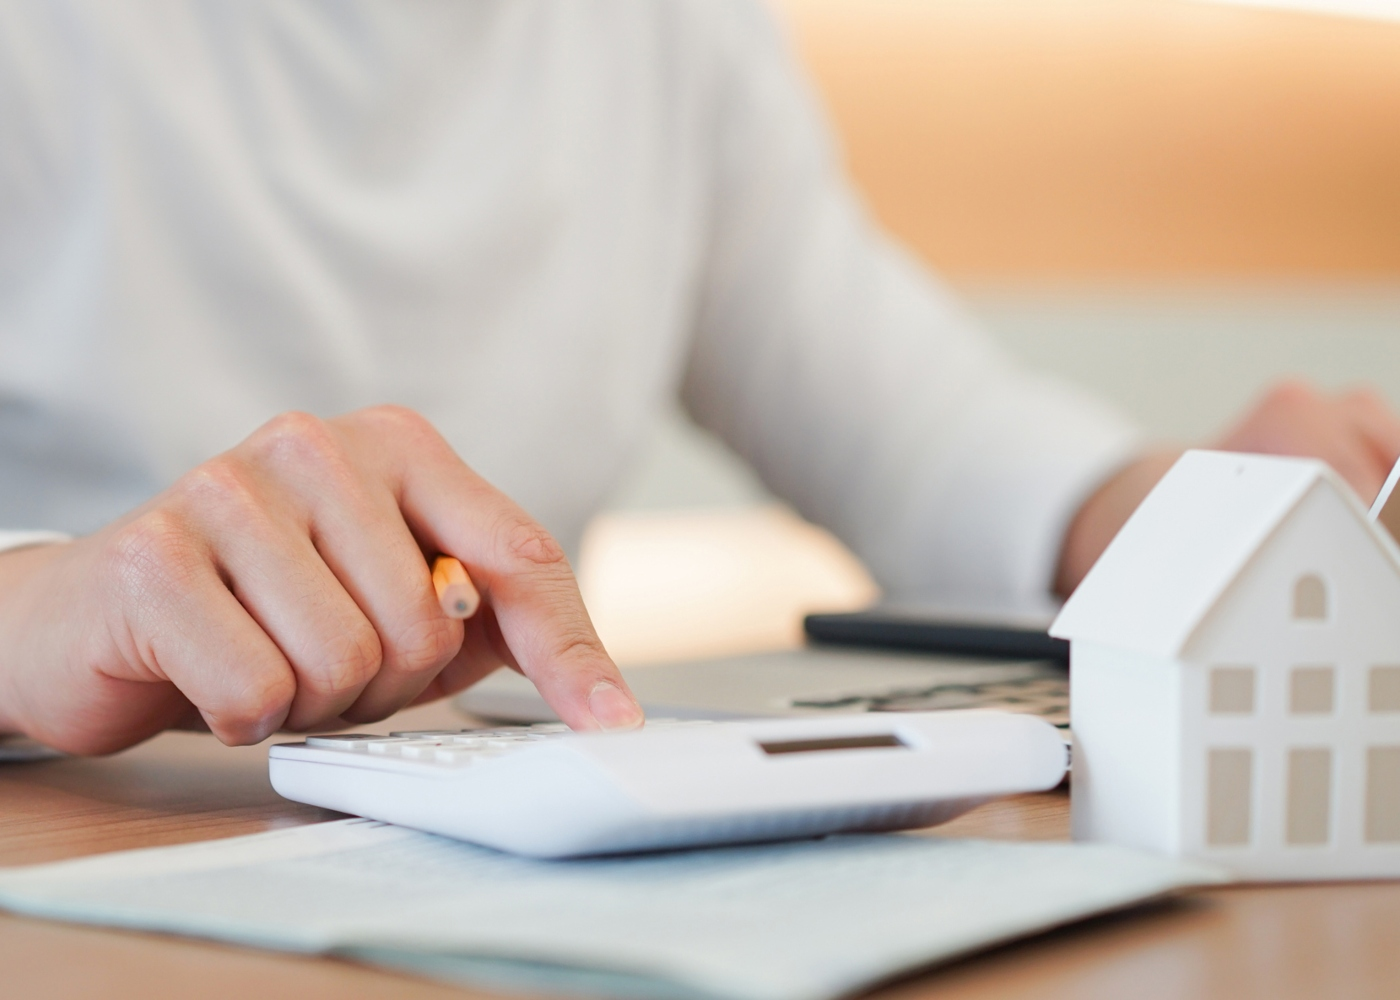 poupar nos seguros associados ao crédito